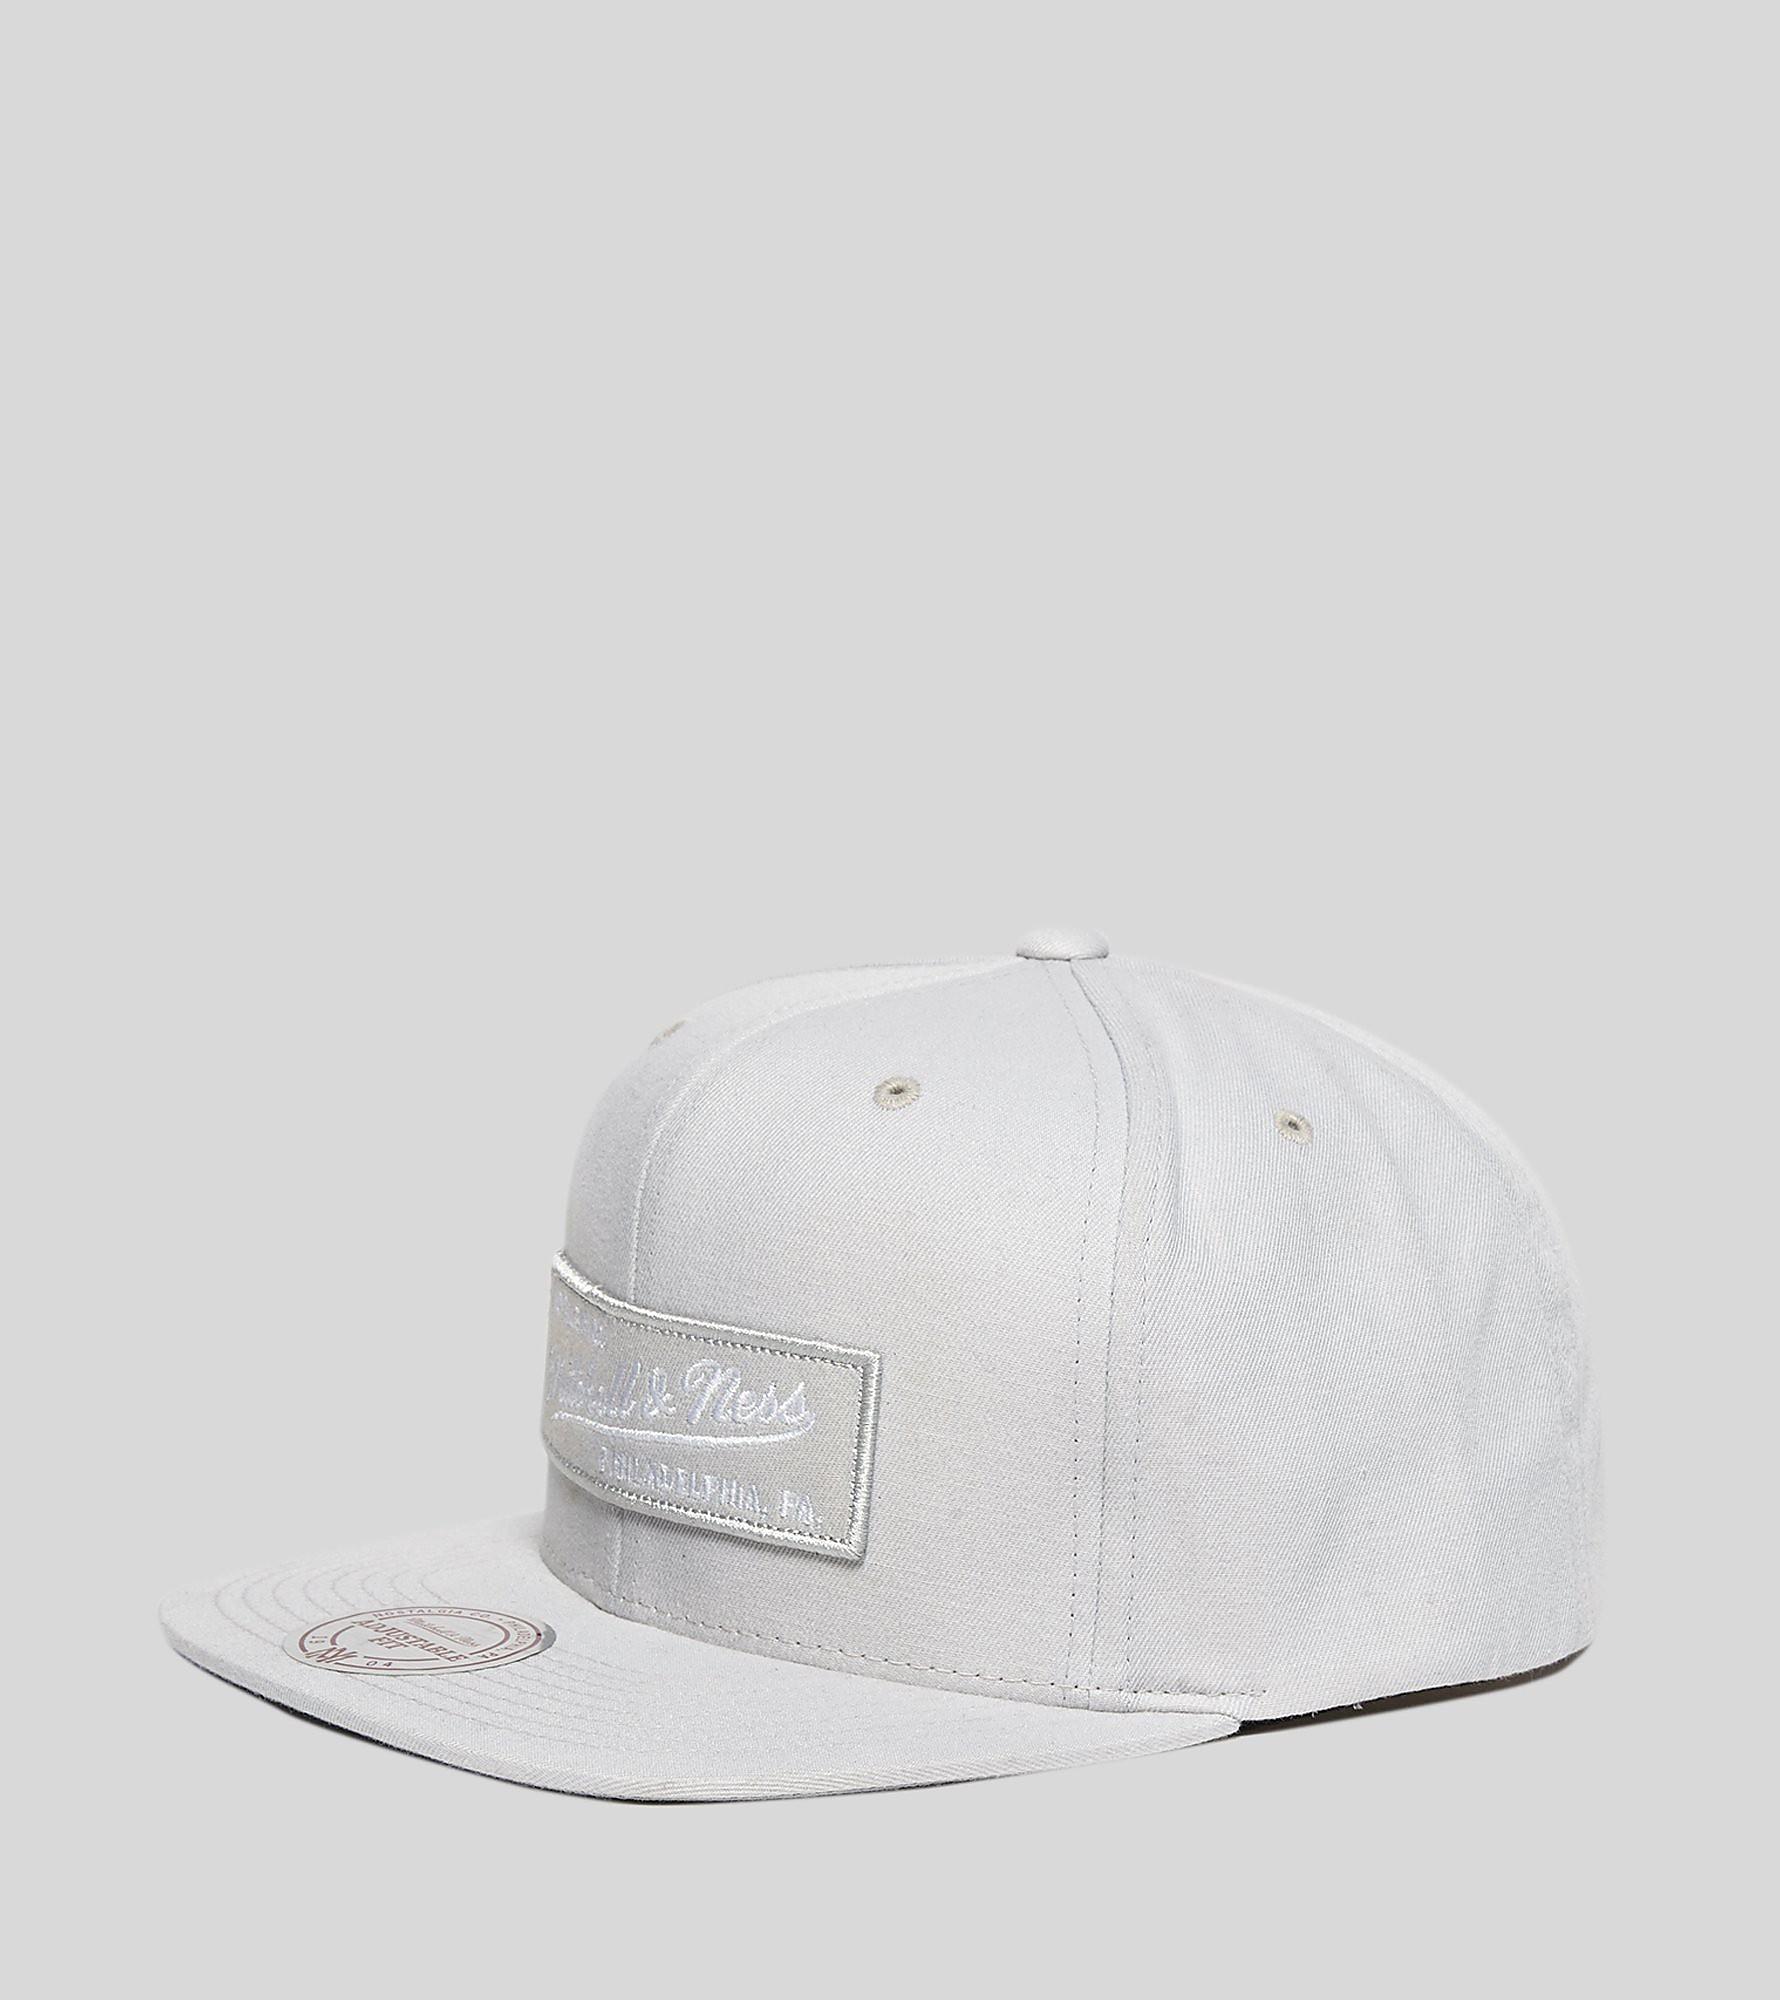 Mitchell & Ness Slub Cotton Snapback Cap